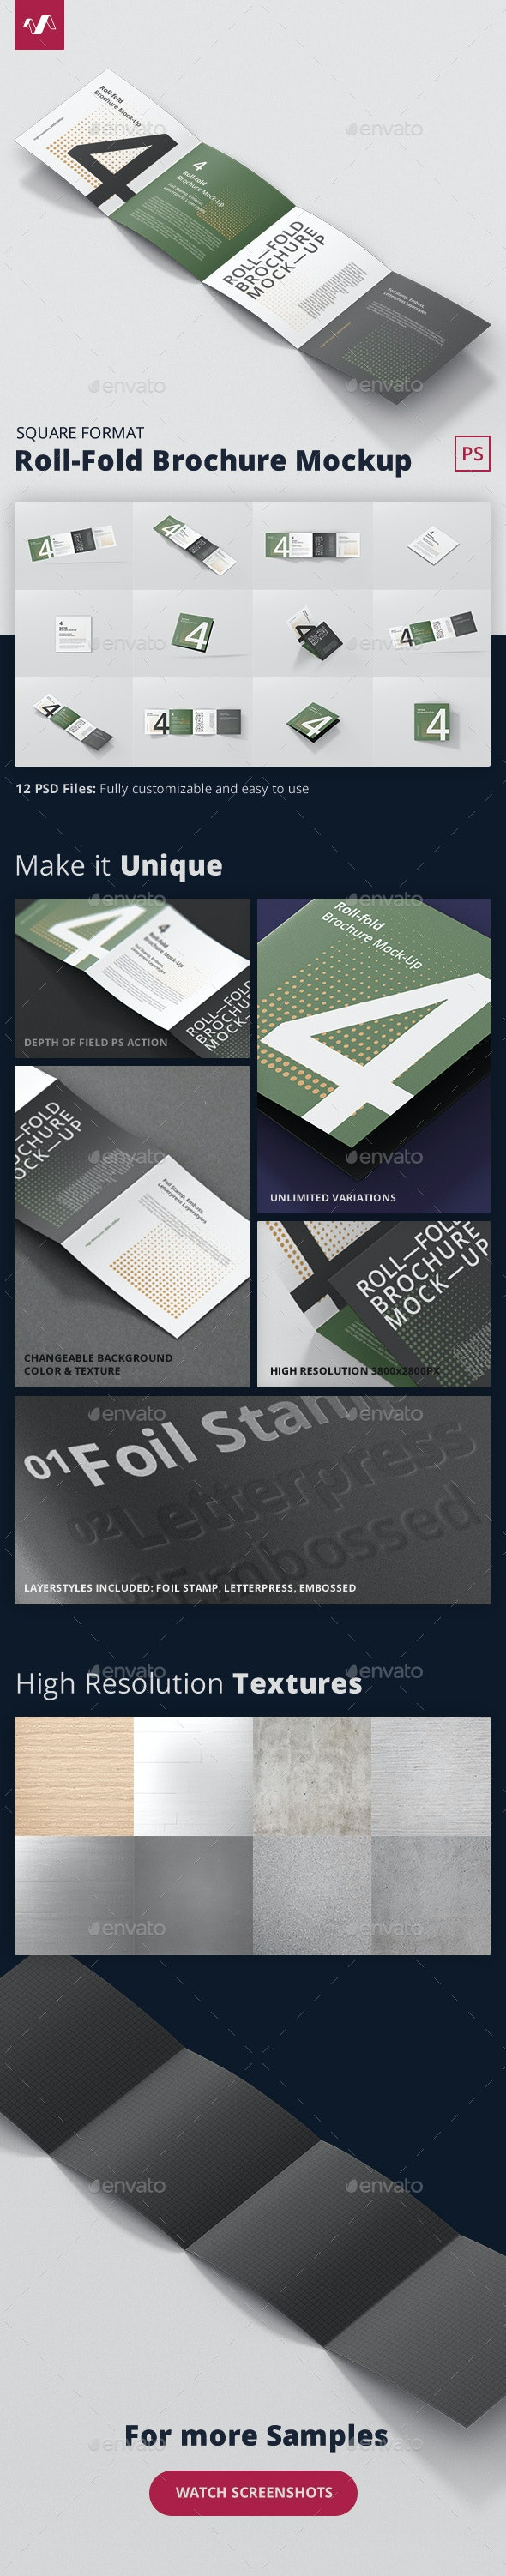 Roll-Fold Brochure Mockup - Square Format - Brochures Print